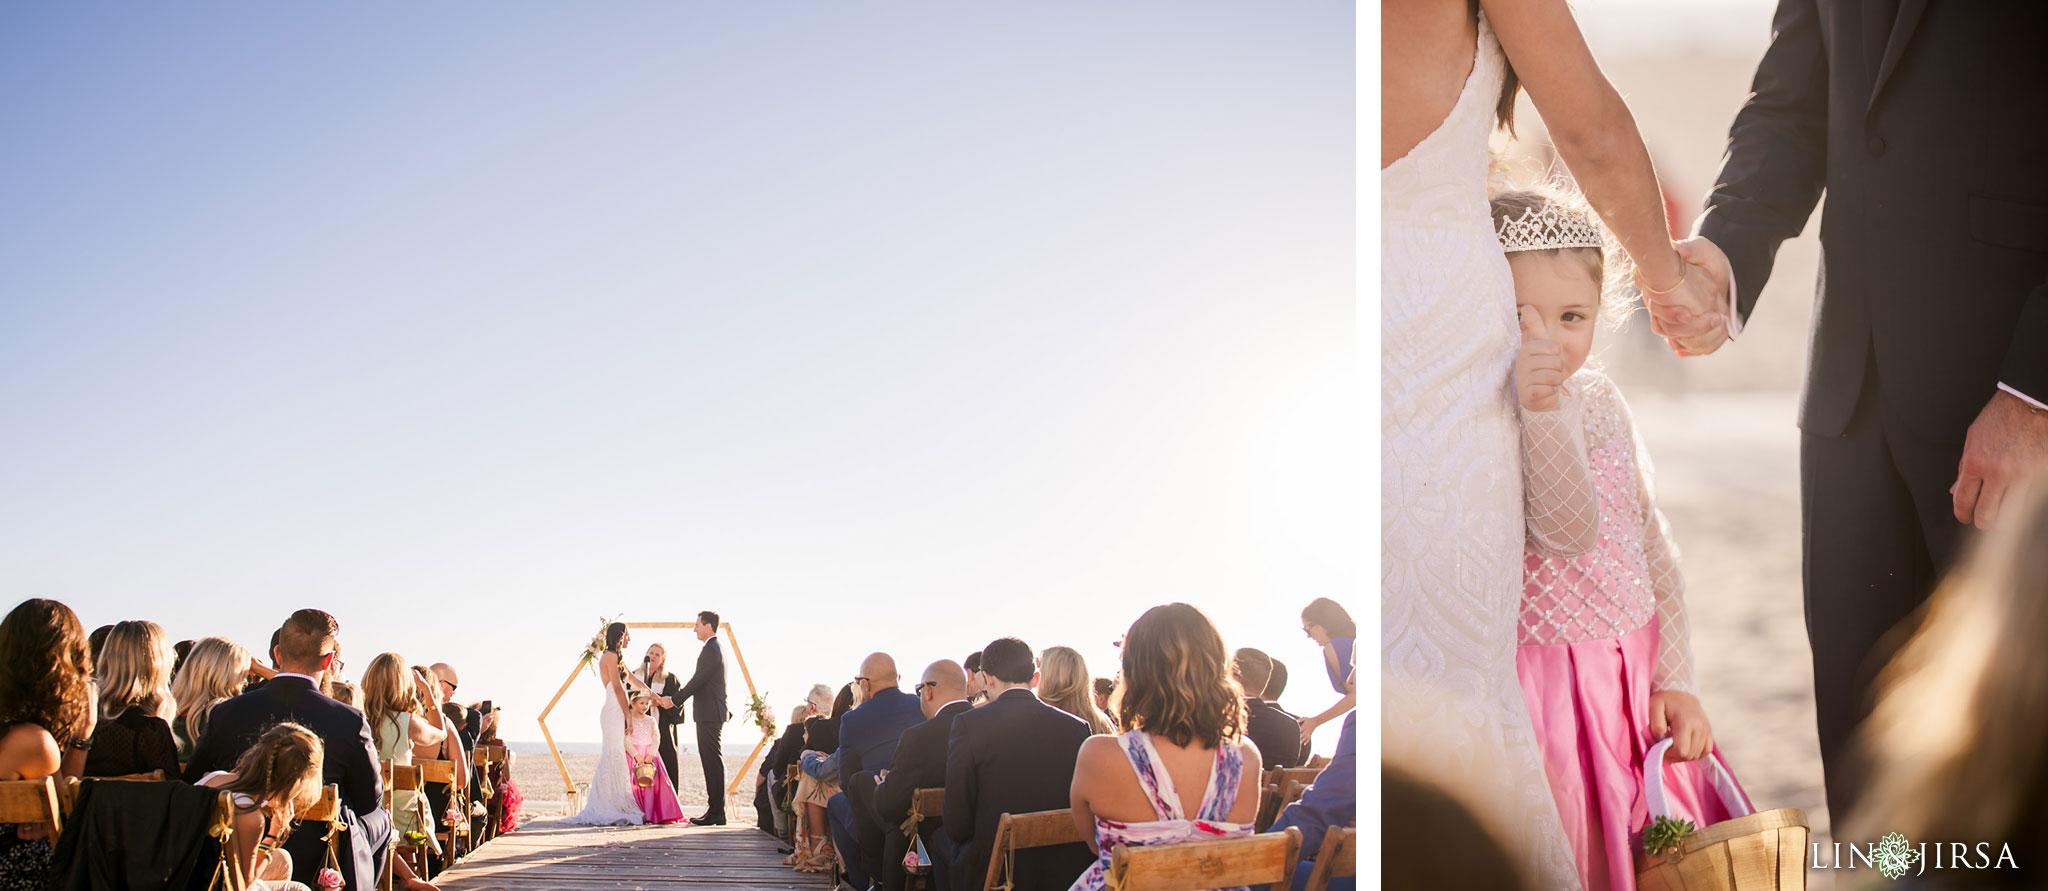 21 Shutters on the Beach Santa Monica Wedding Photography